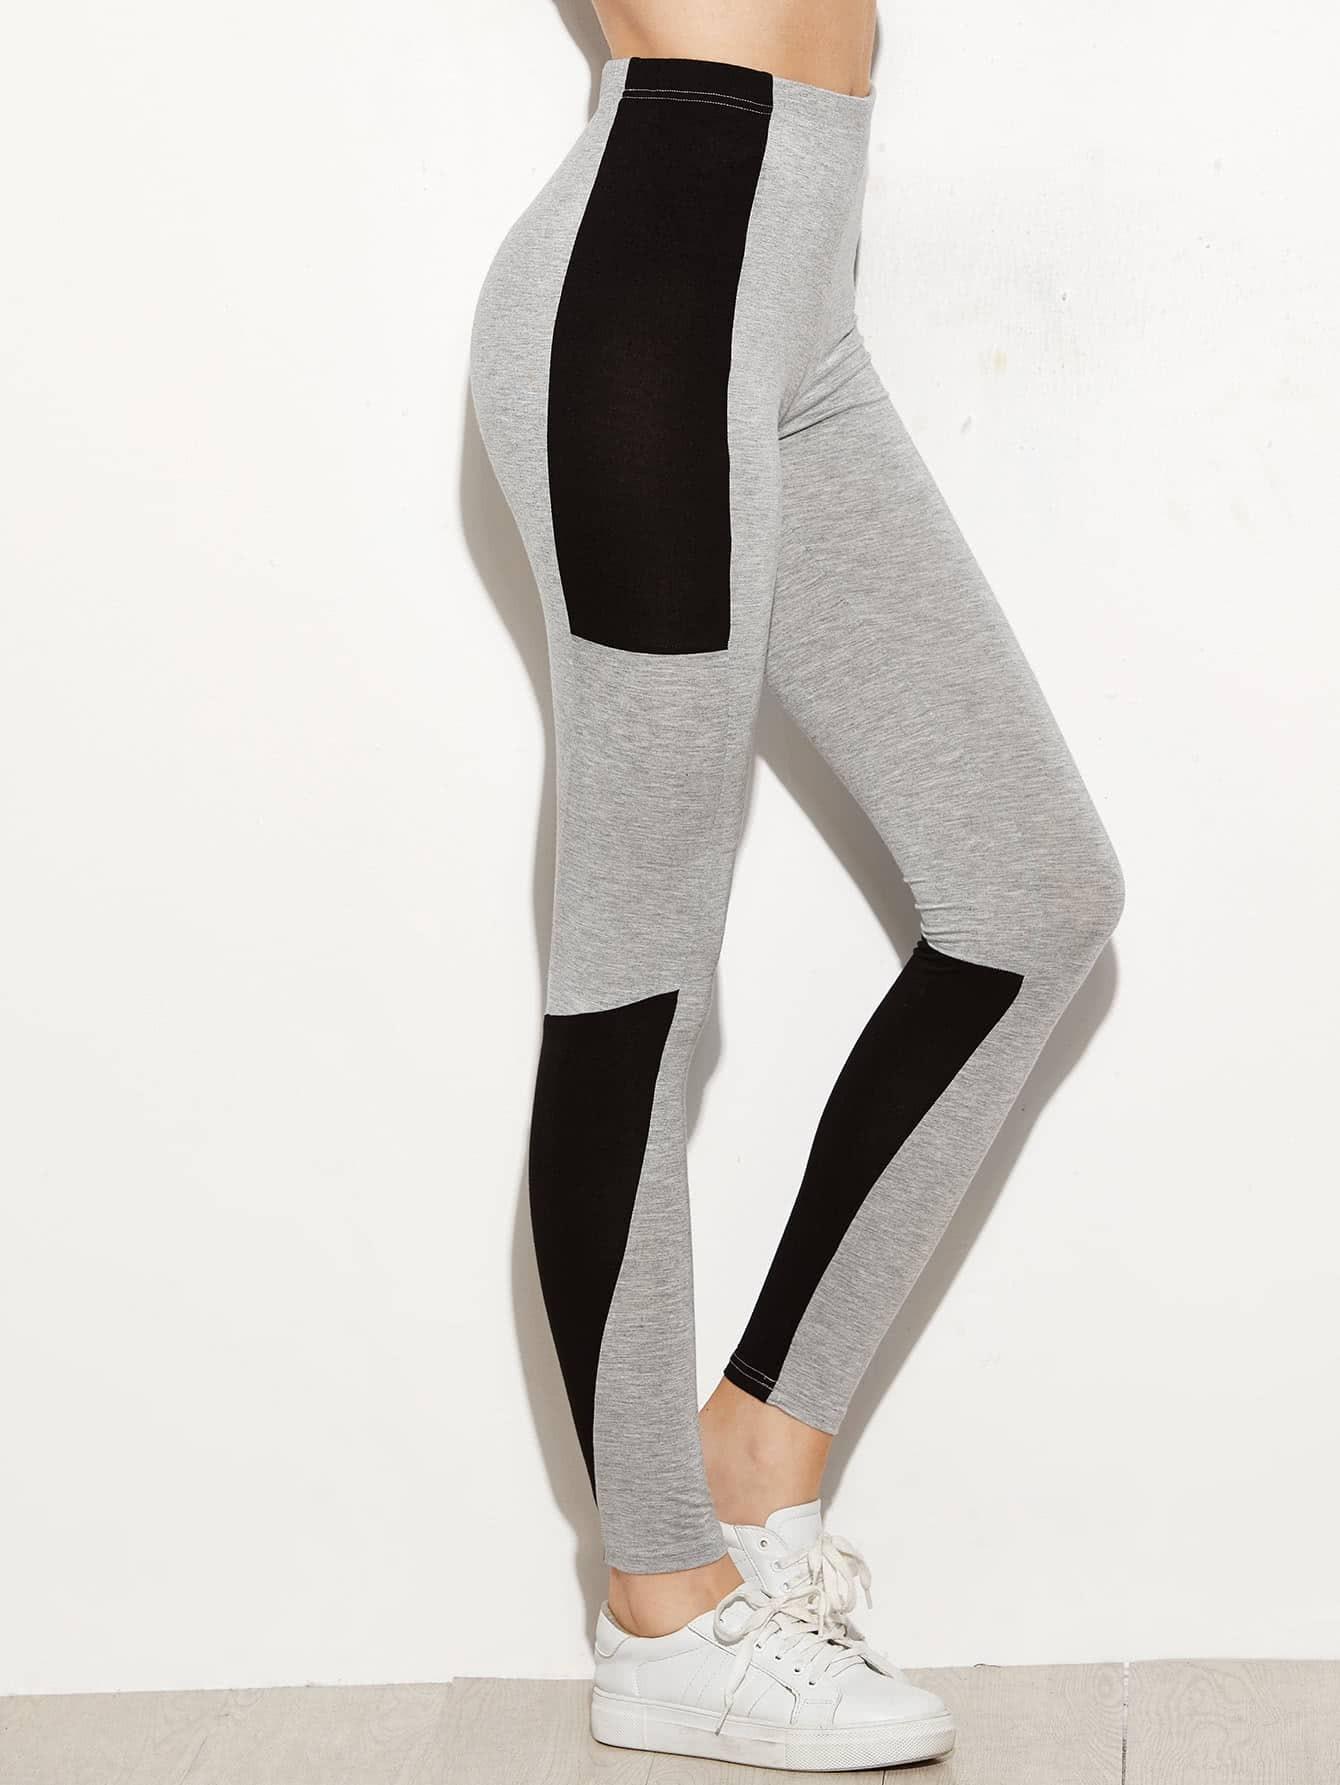 Color Block High Waist Leggings leggings161110701